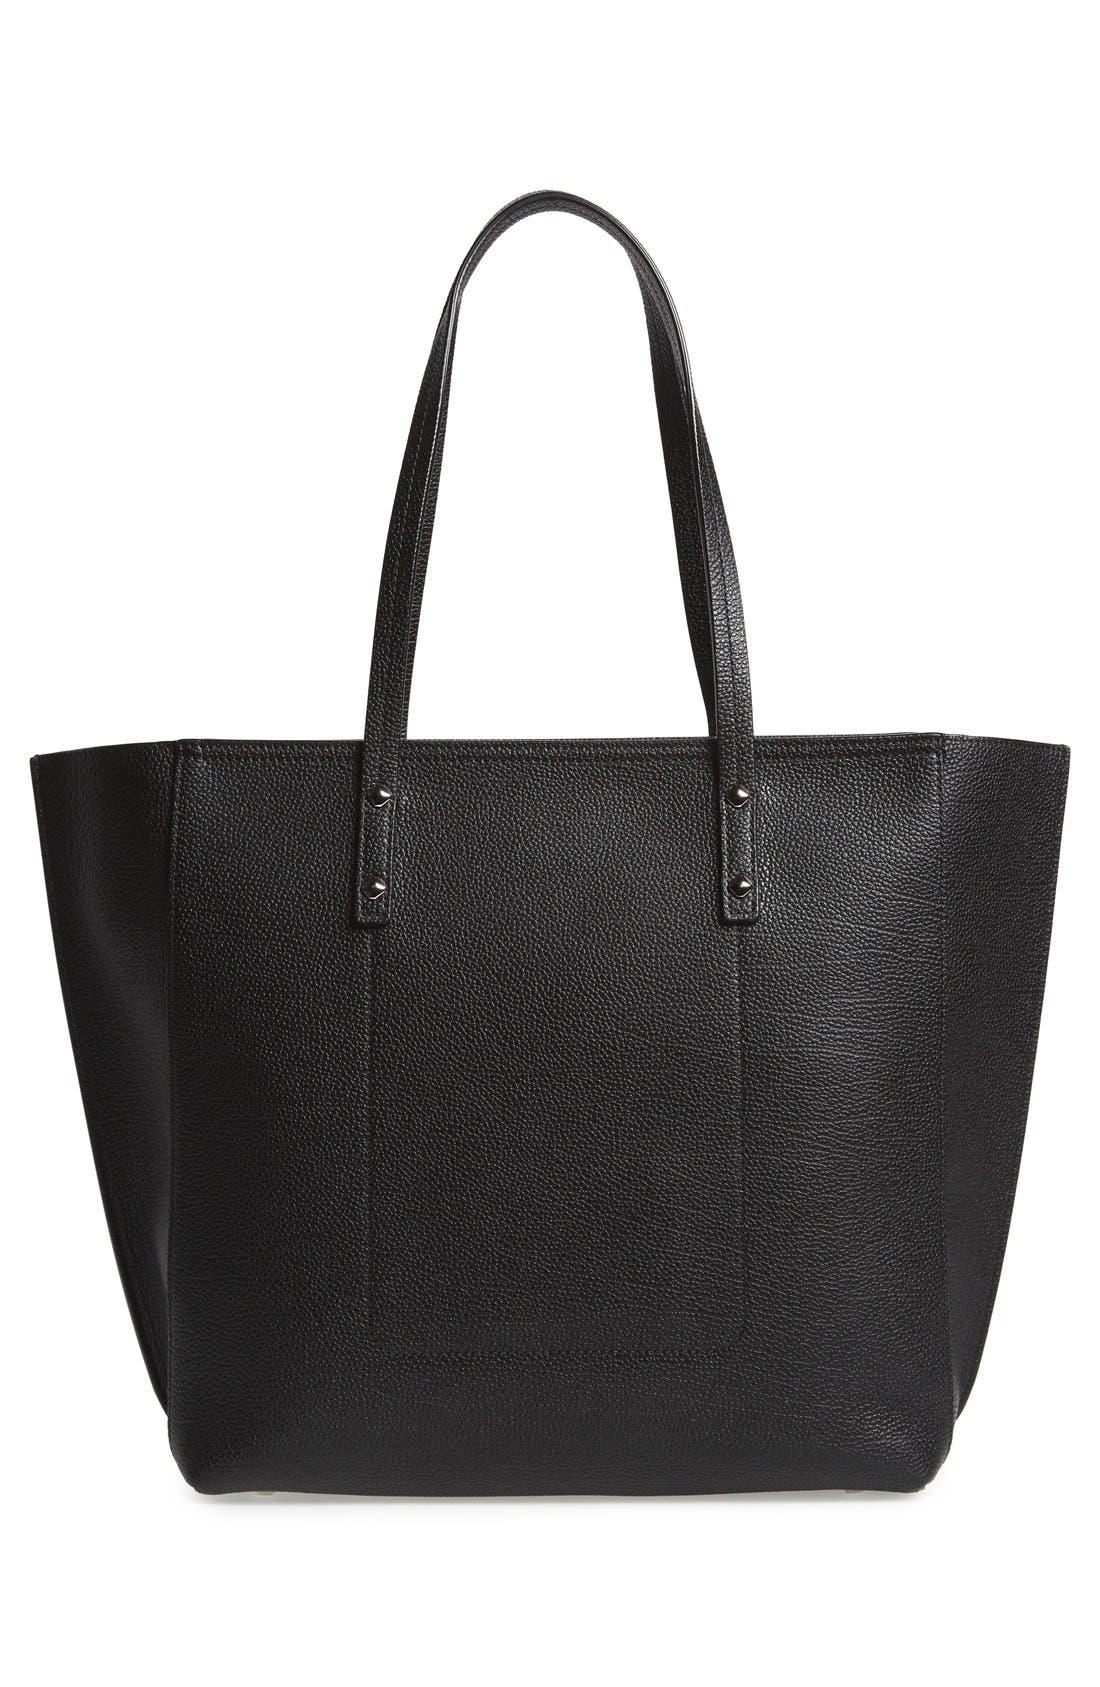 'Medium Sophie' Leather Shopper,                             Alternate thumbnail 3, color,                             Black